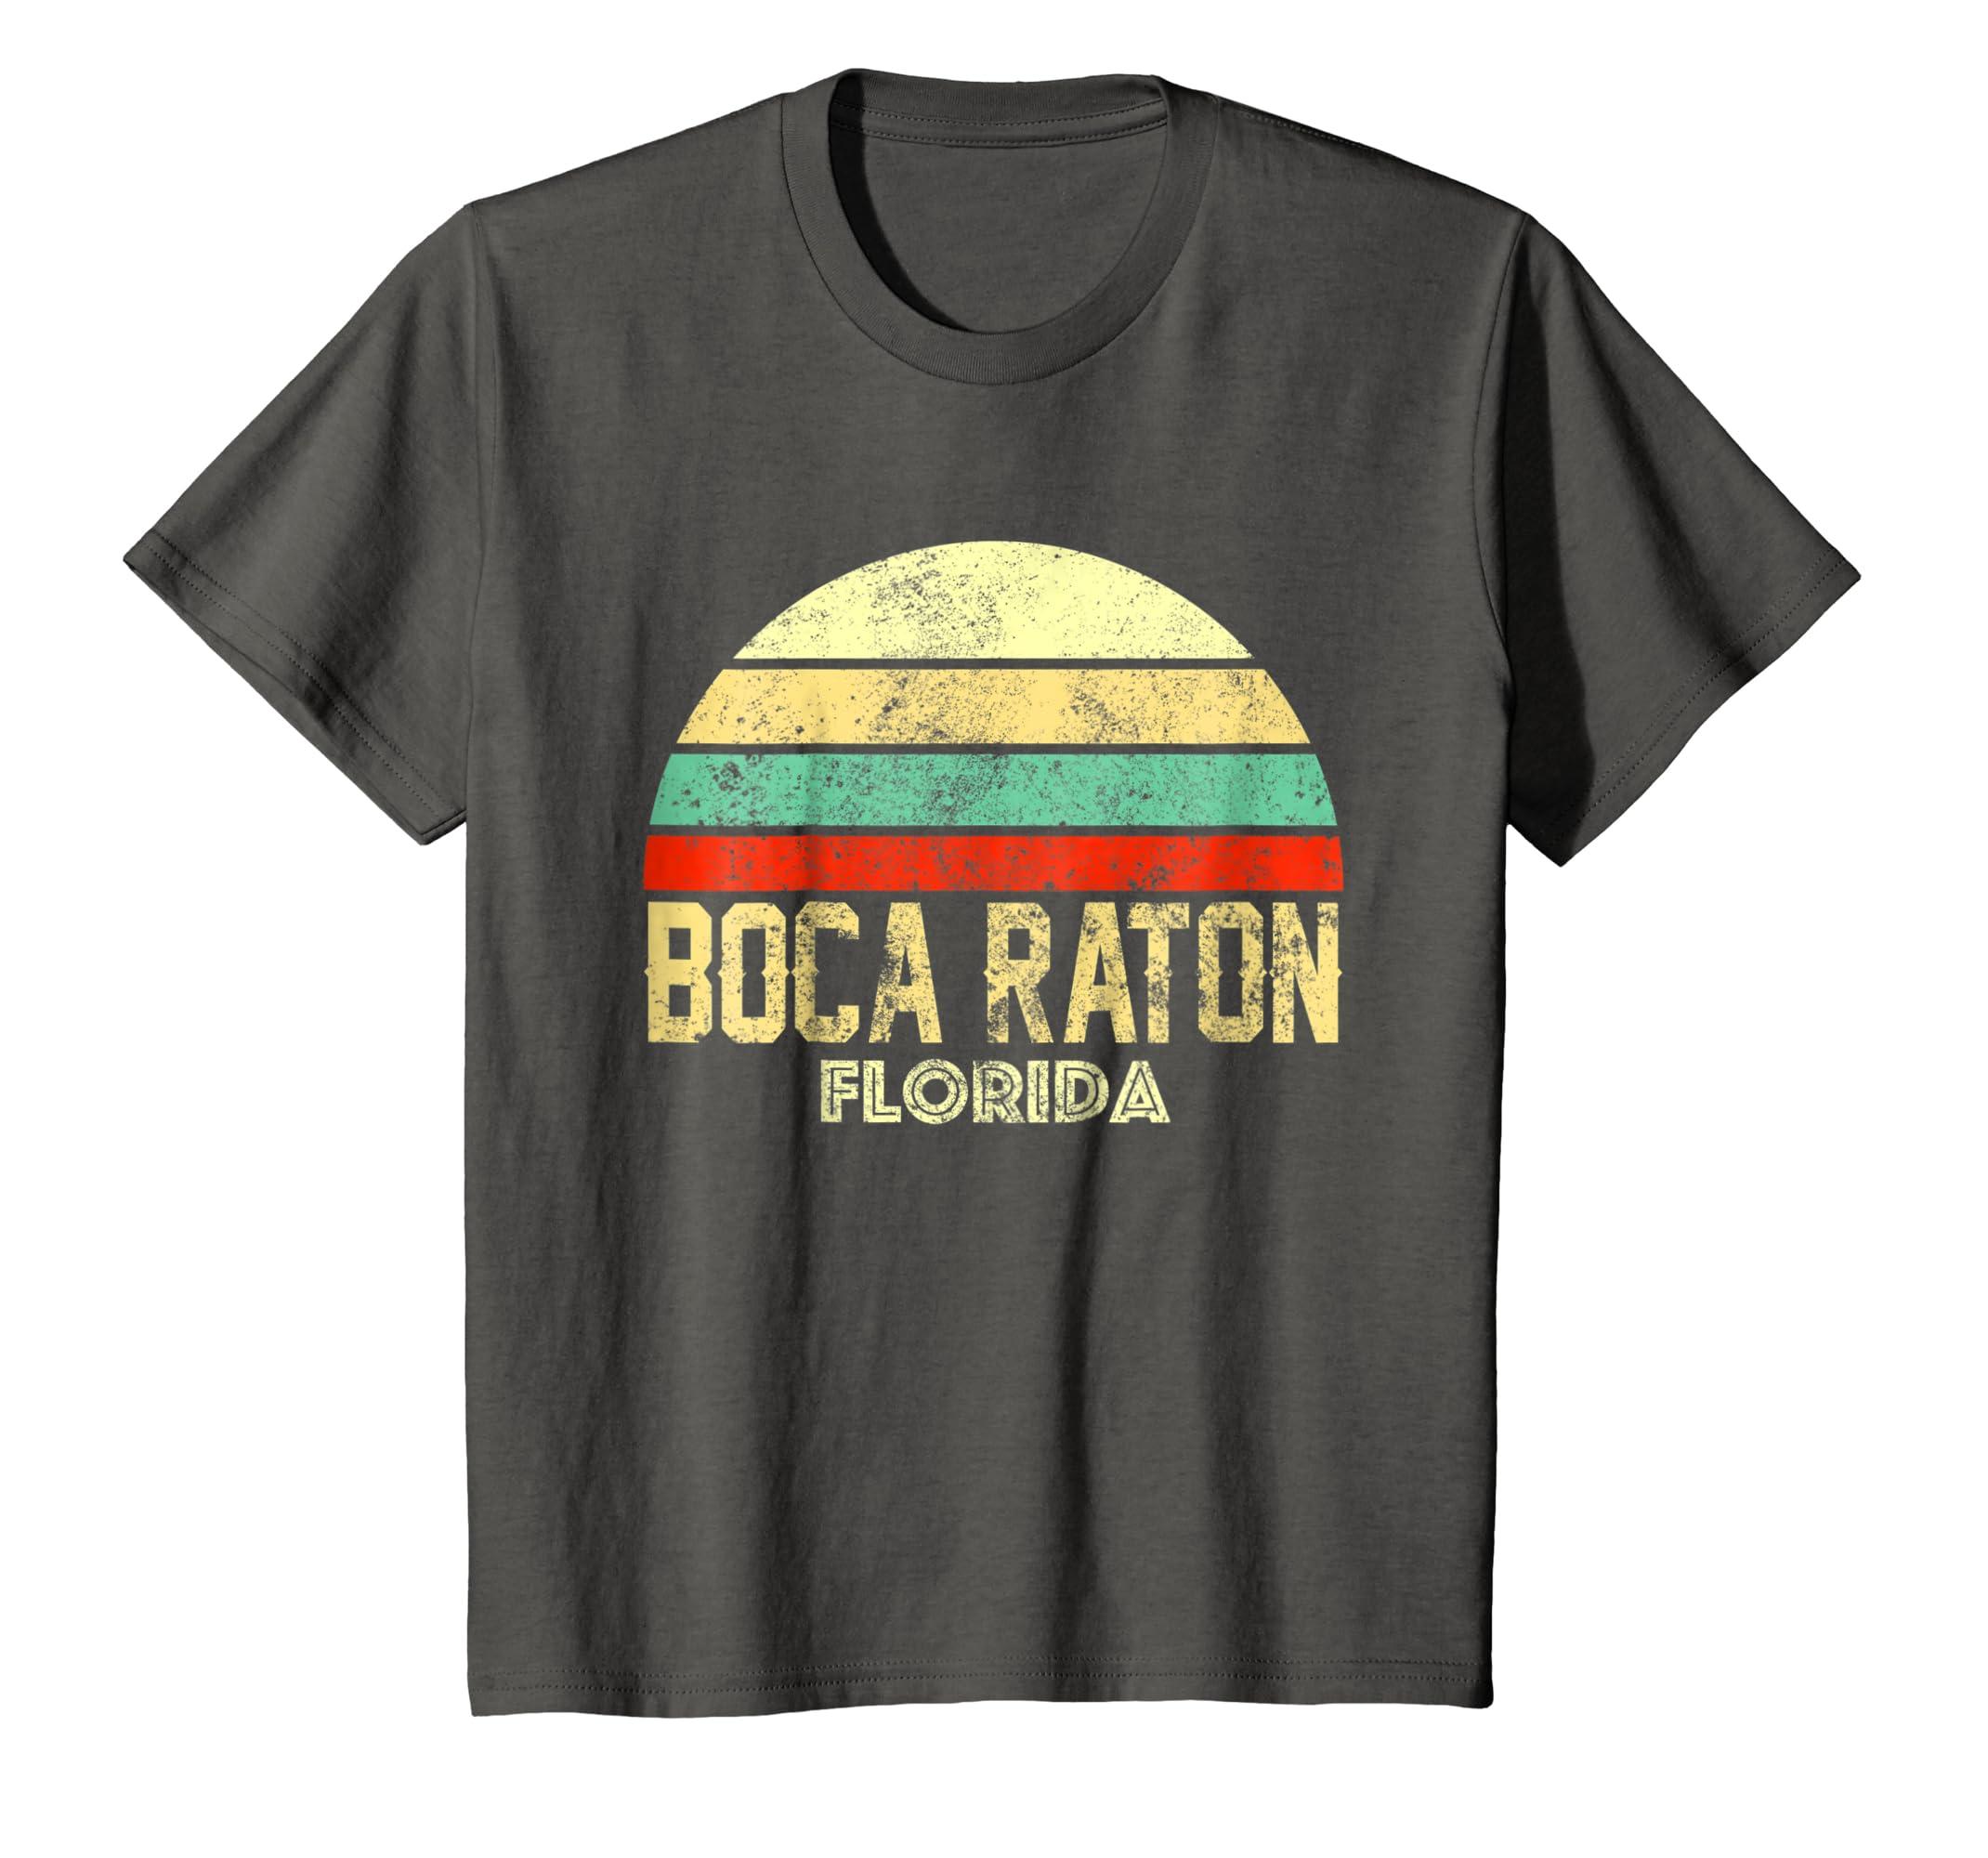 Amazon.com: Boca Raton FL Florida Vintage Retro Sunset Tee T ...